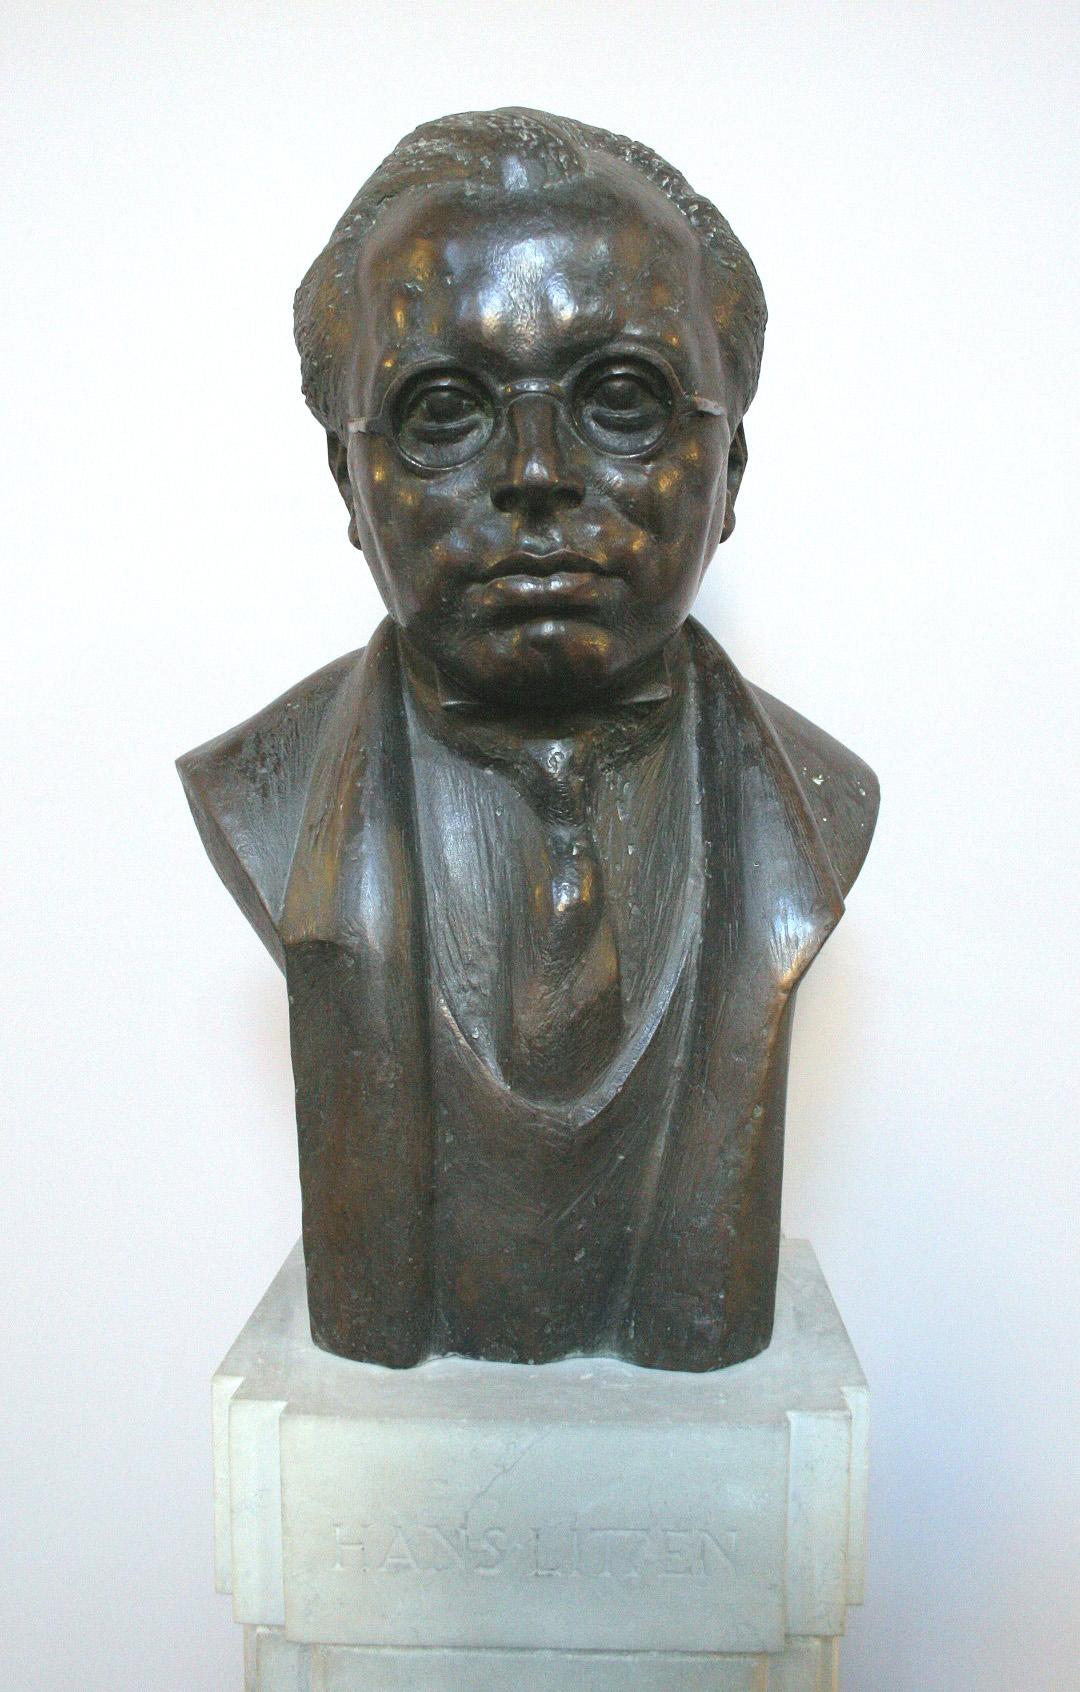 Hans Litten - Wikipedia